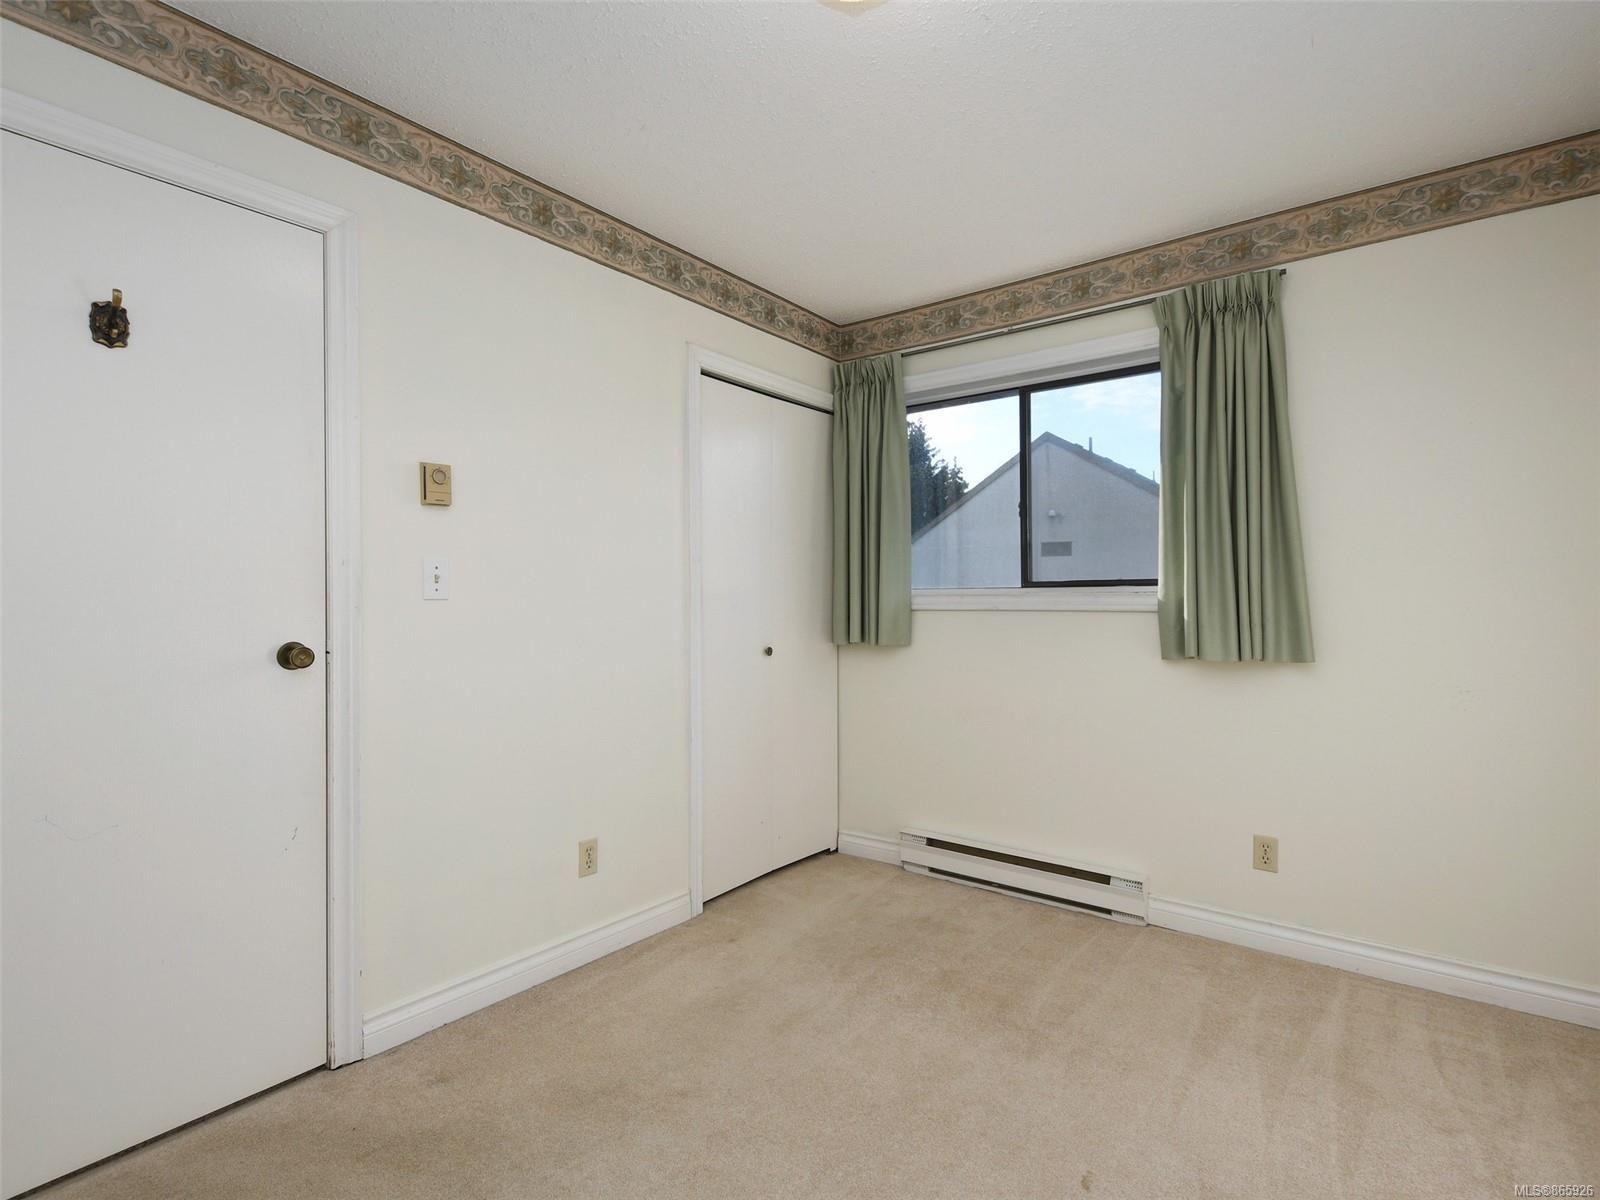 Photo 16: Photos: 8 4350 West Saanich Rd in : SW Royal Oak Row/Townhouse for sale (Saanich West)  : MLS®# 865926